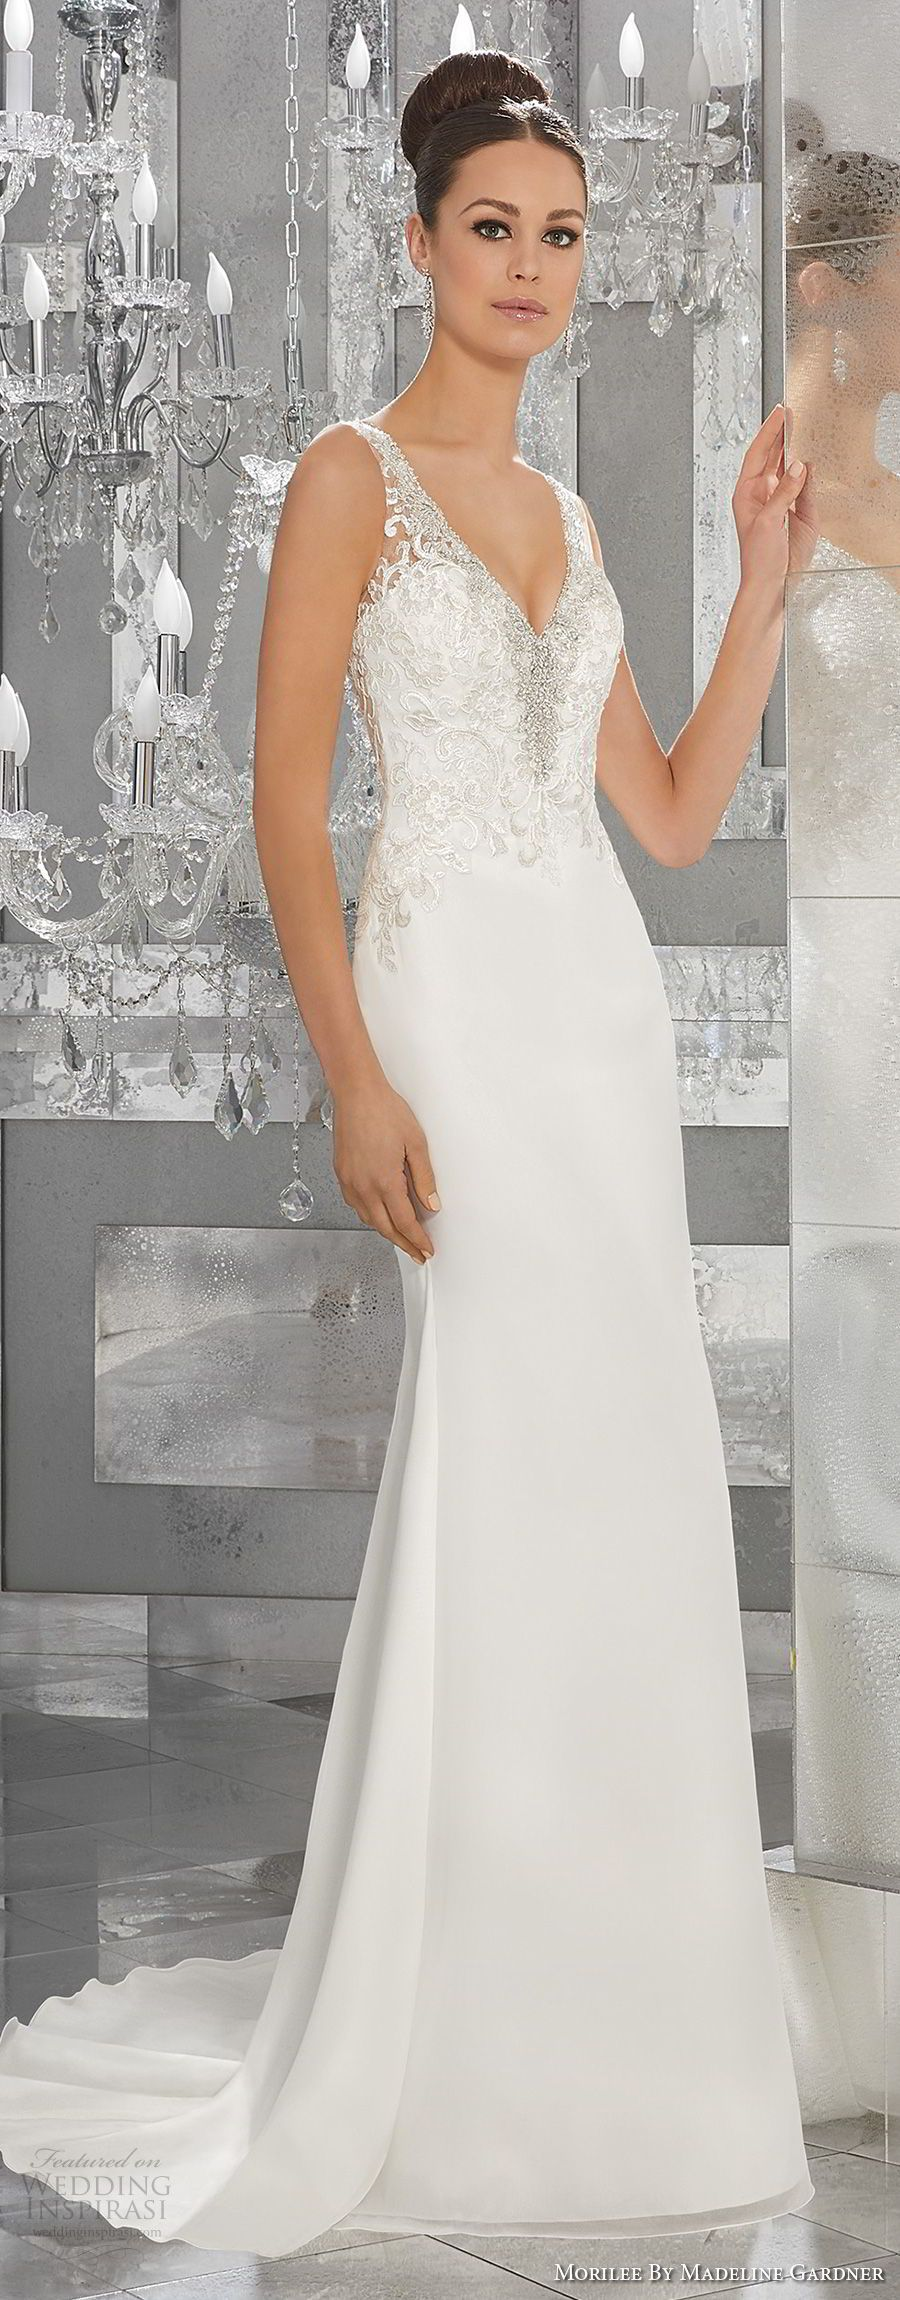 Mori lee madeline gardner wedding dress  Morilee by Madeline Gardner Fall  Blu Bridal Collection  Dream